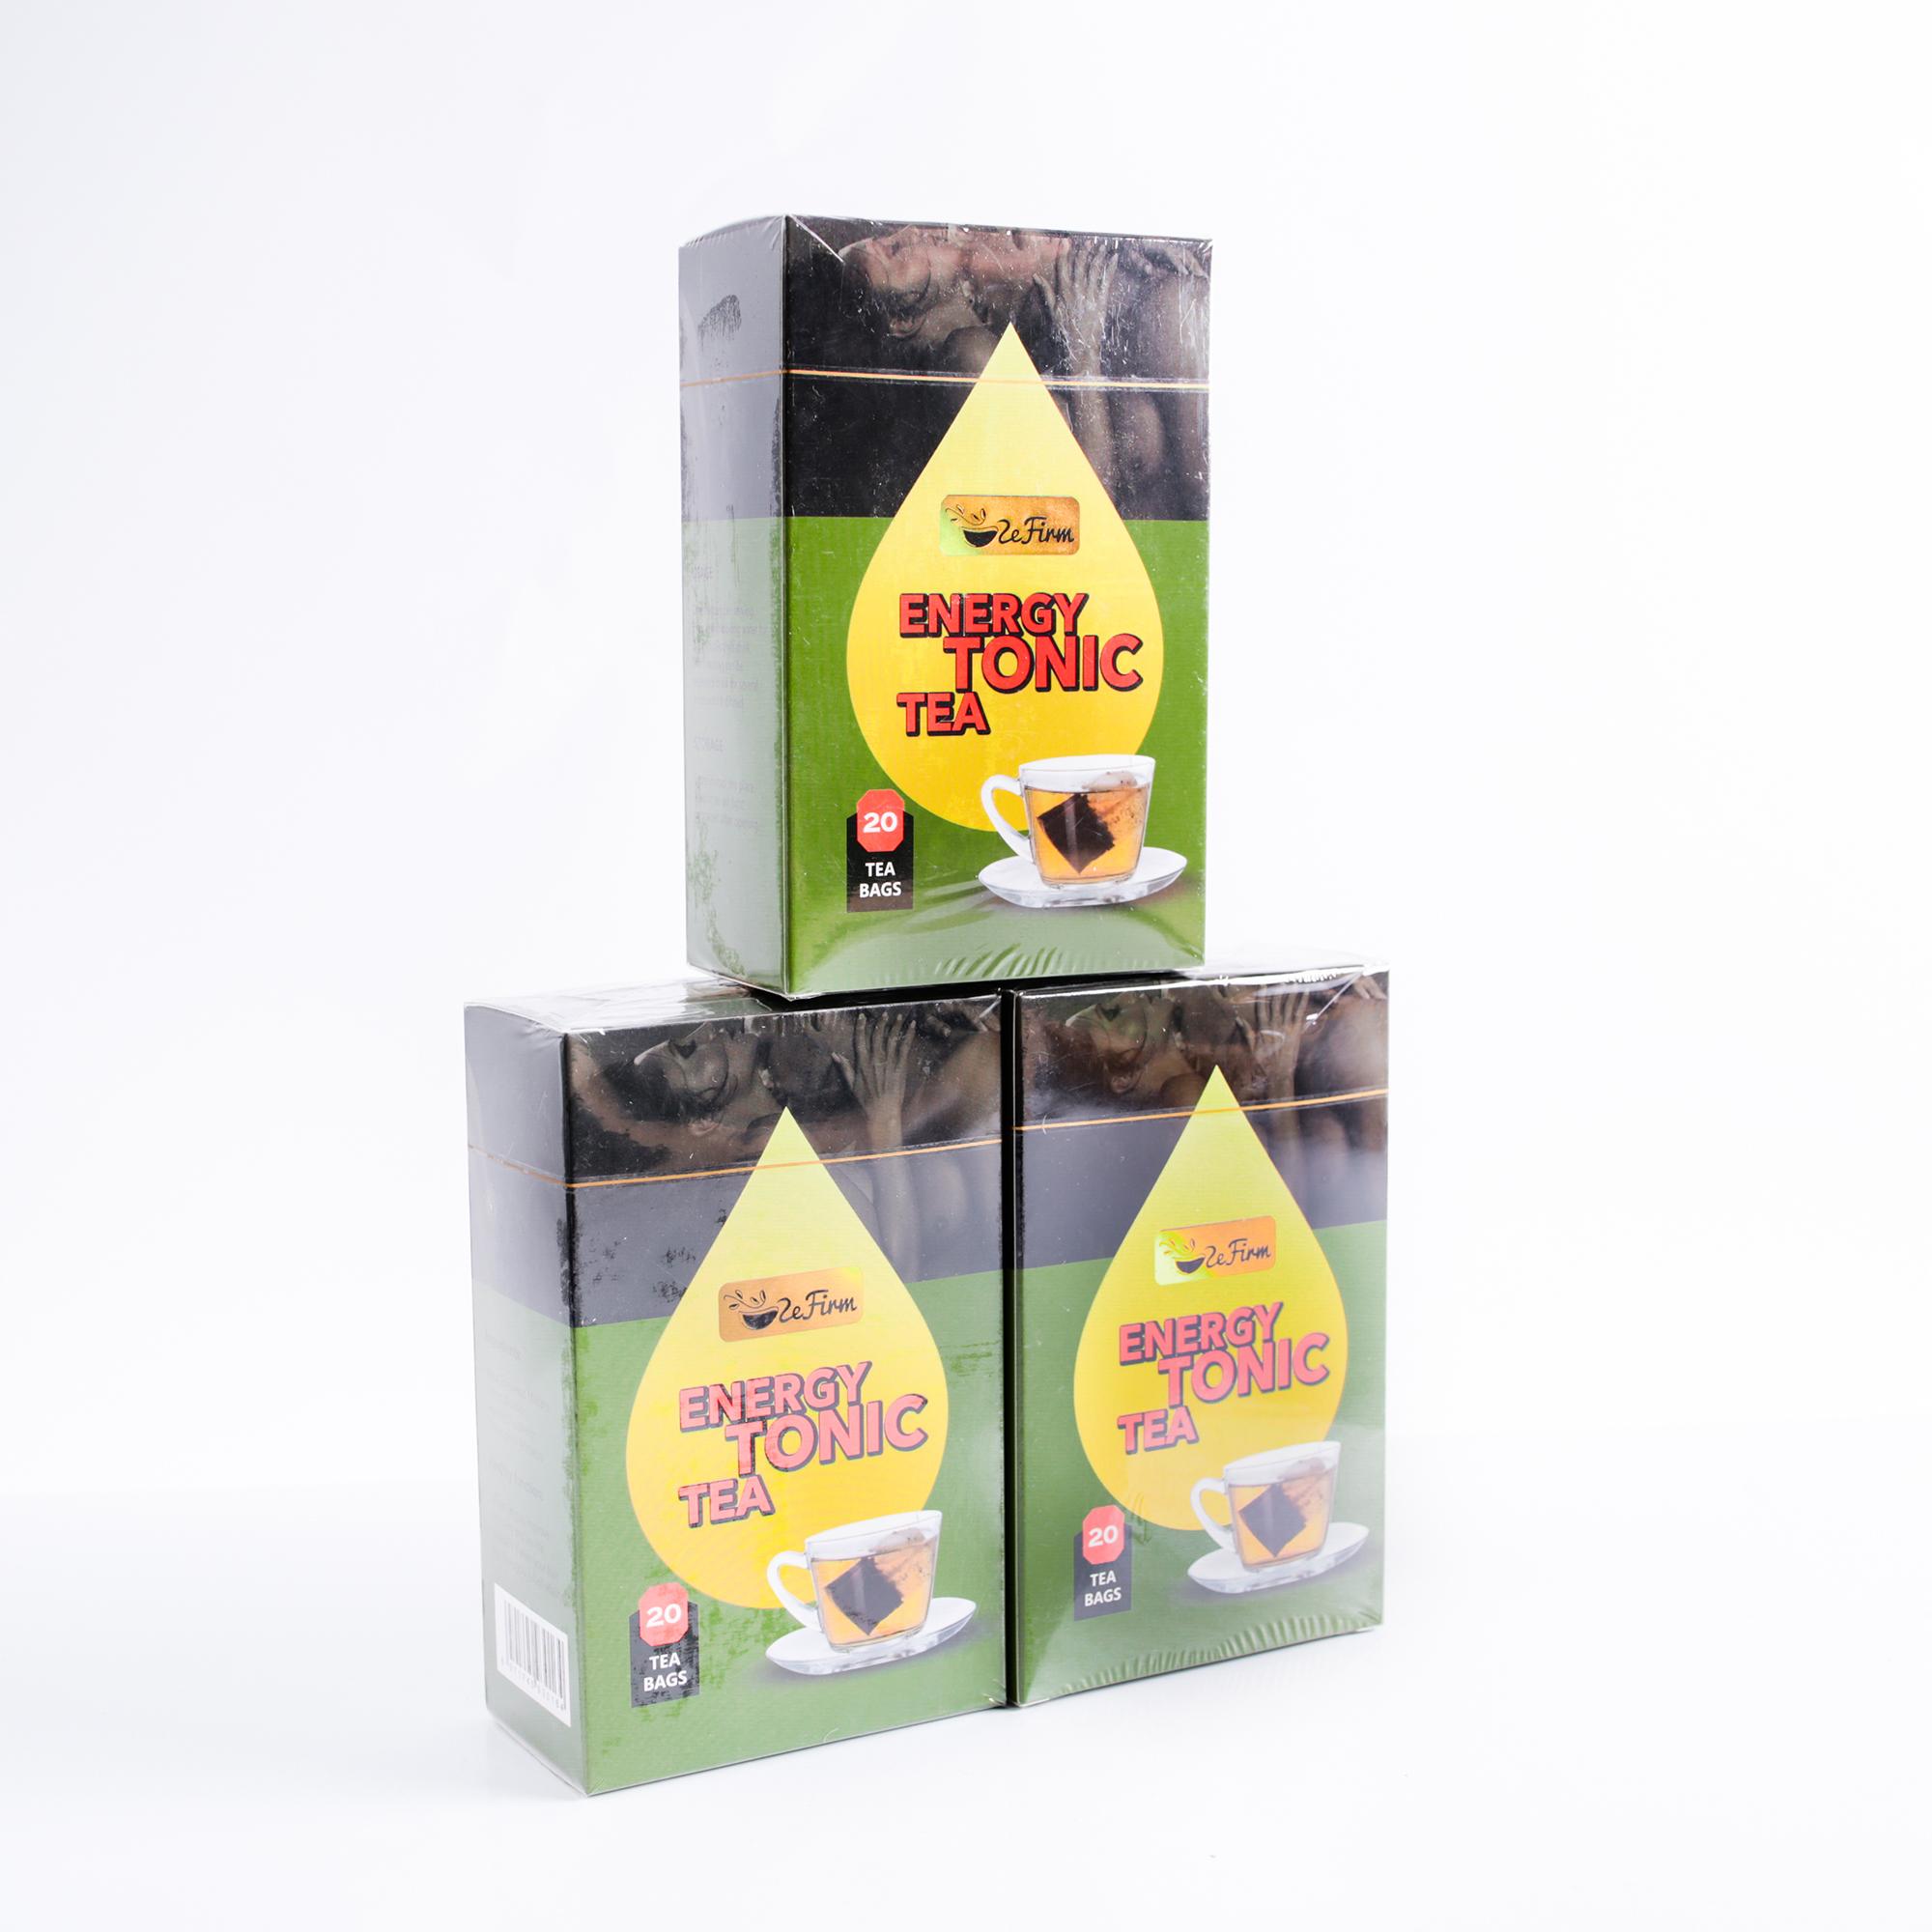 The lowest price OEM and wholesale all kinds of sachet energy tonic herbal tea - 4uTea | 4uTea.com